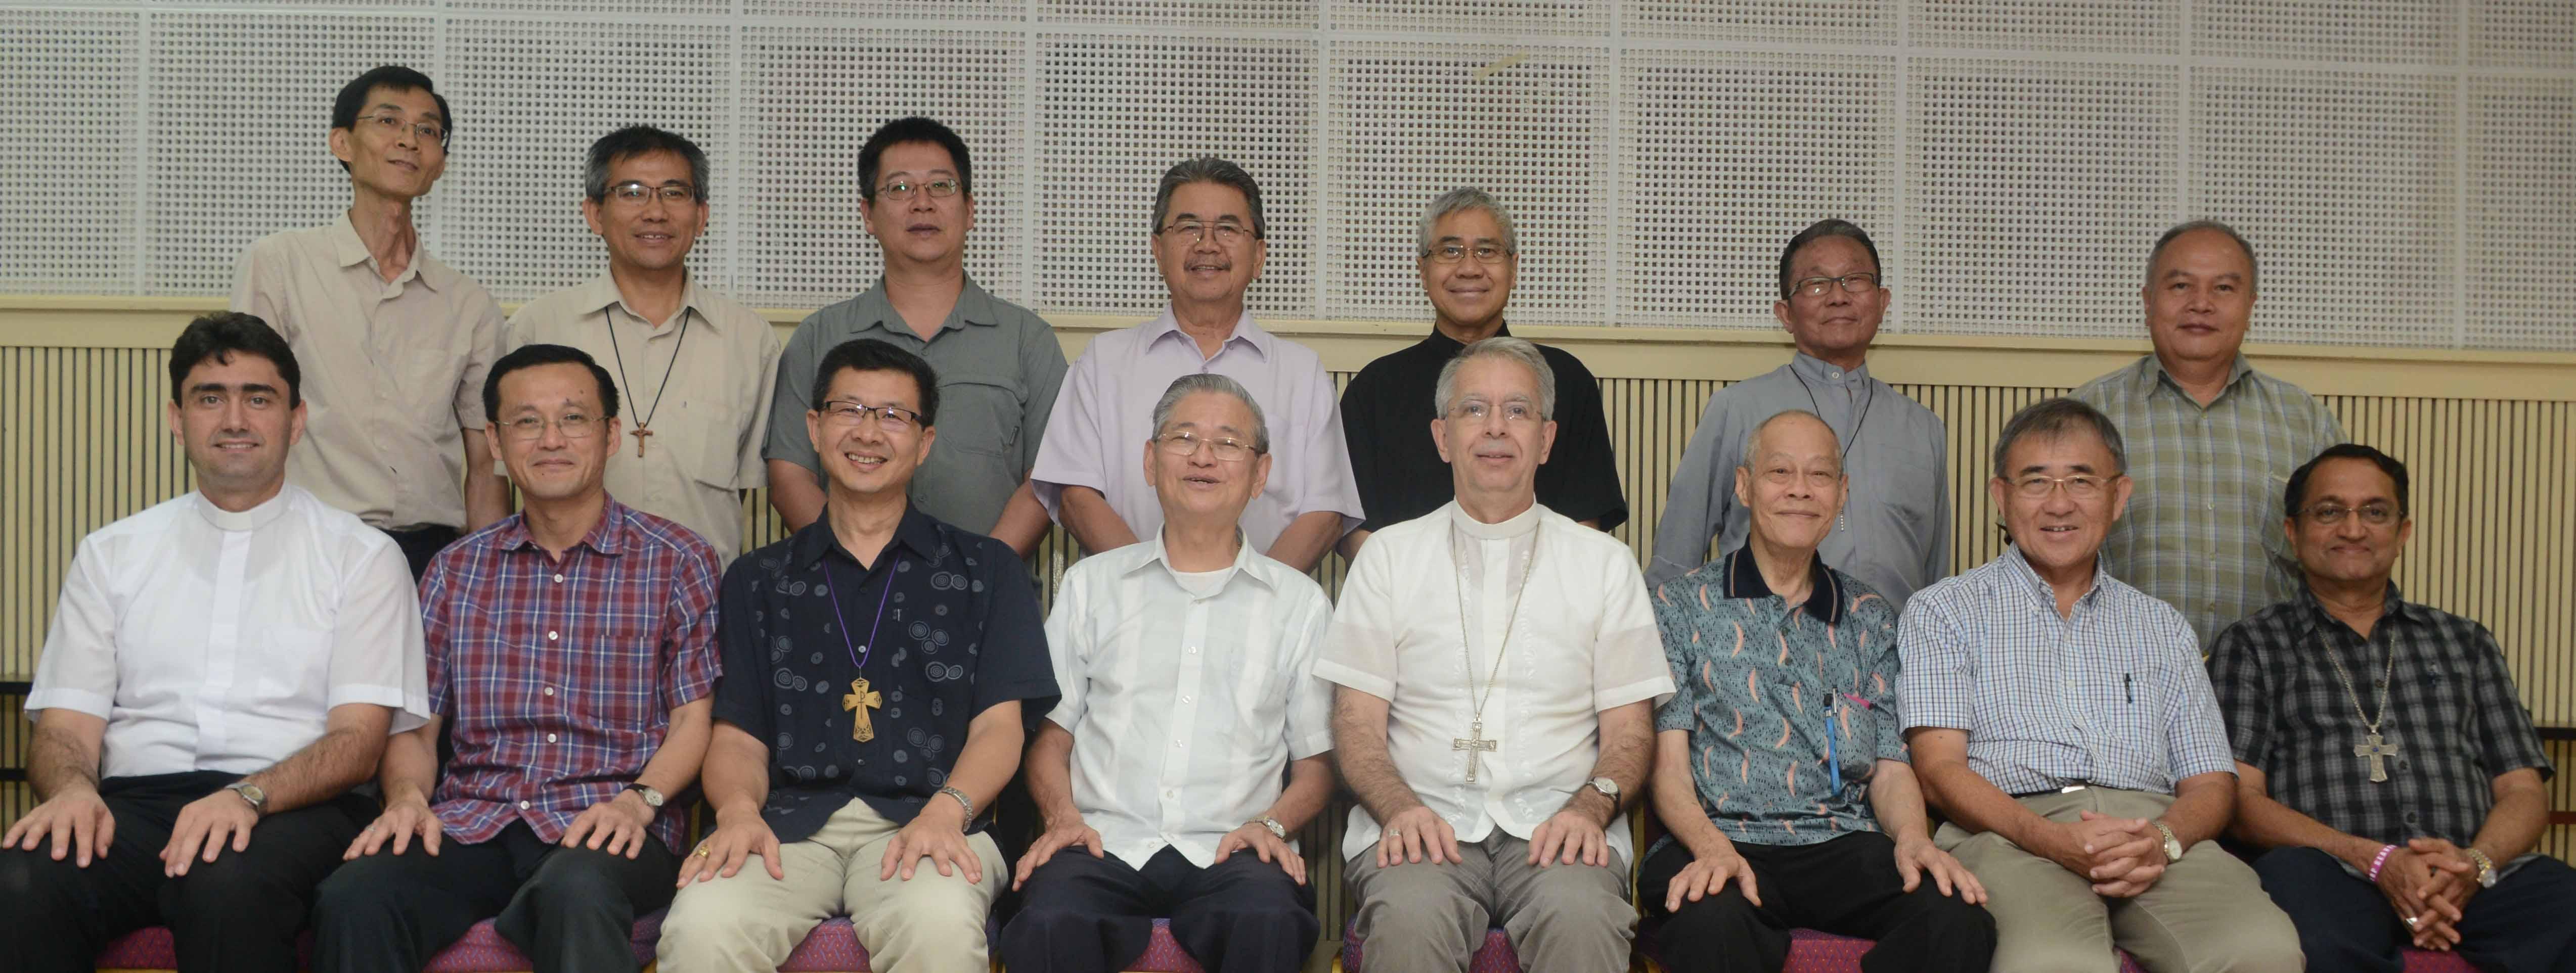 Obispos de Malasia-Singapur-Brunei, 95ª Asamblea Plenaria © Diócesis de Kota Kinabalu